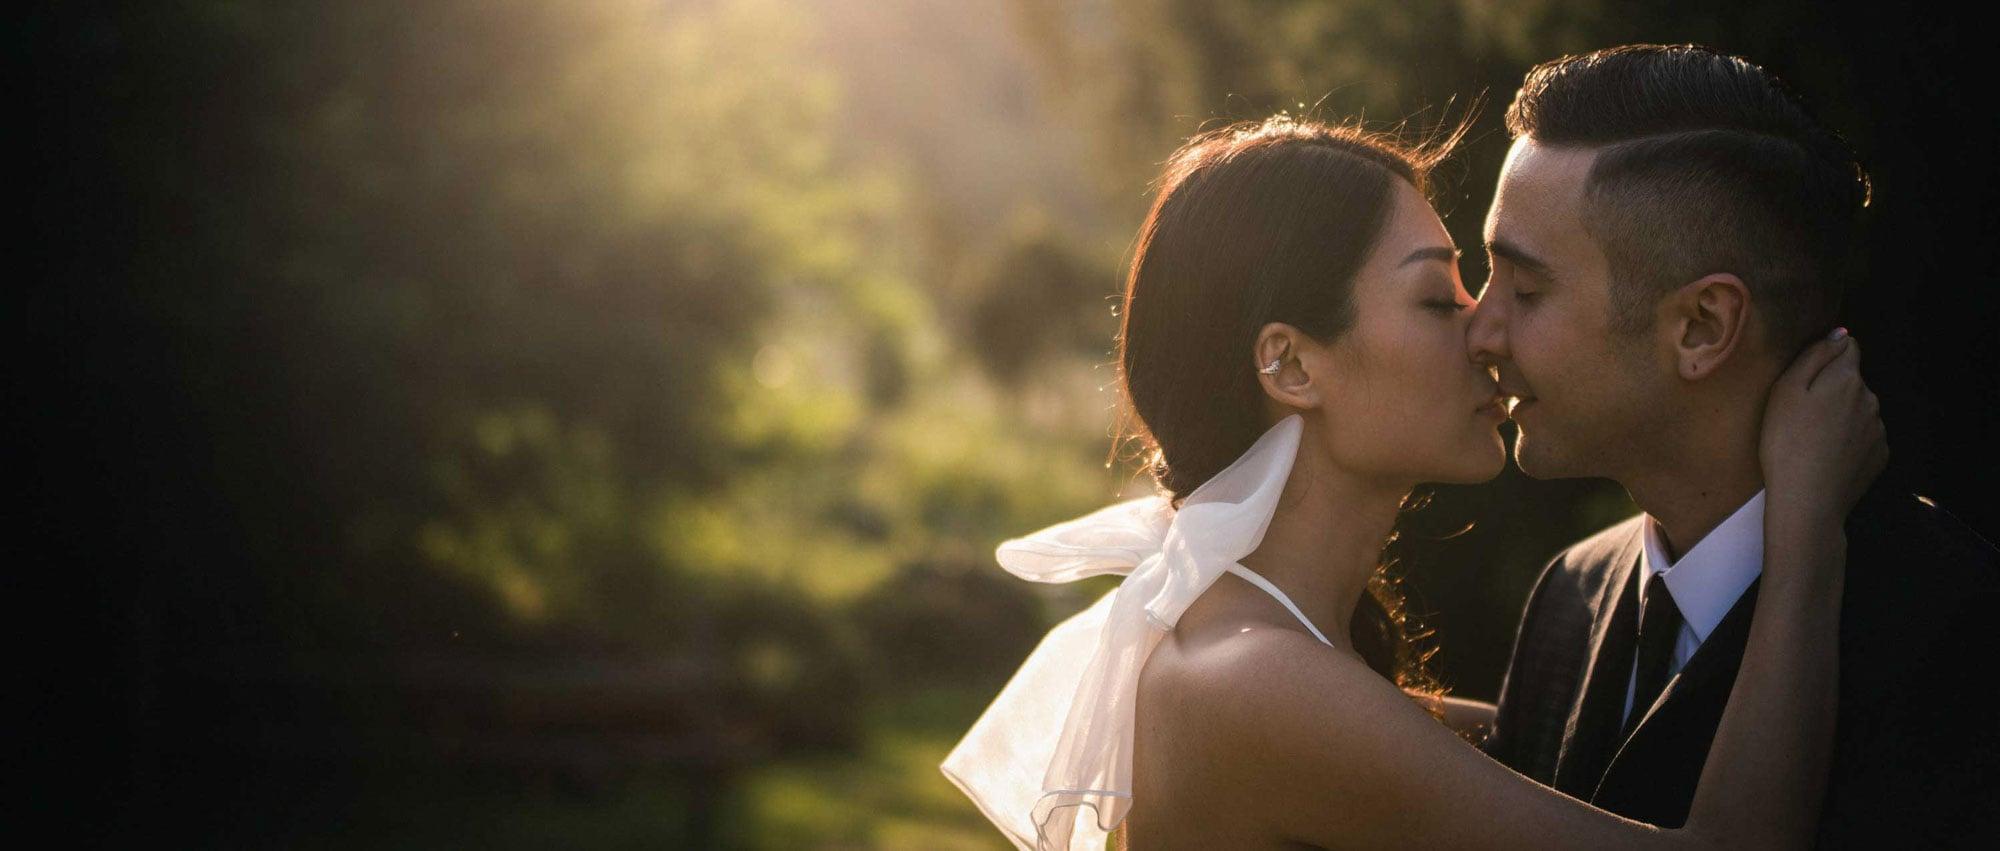 fotografo matrimonio simbolico vicenza 045 1 - O + M - Symbolic Wedding Italy